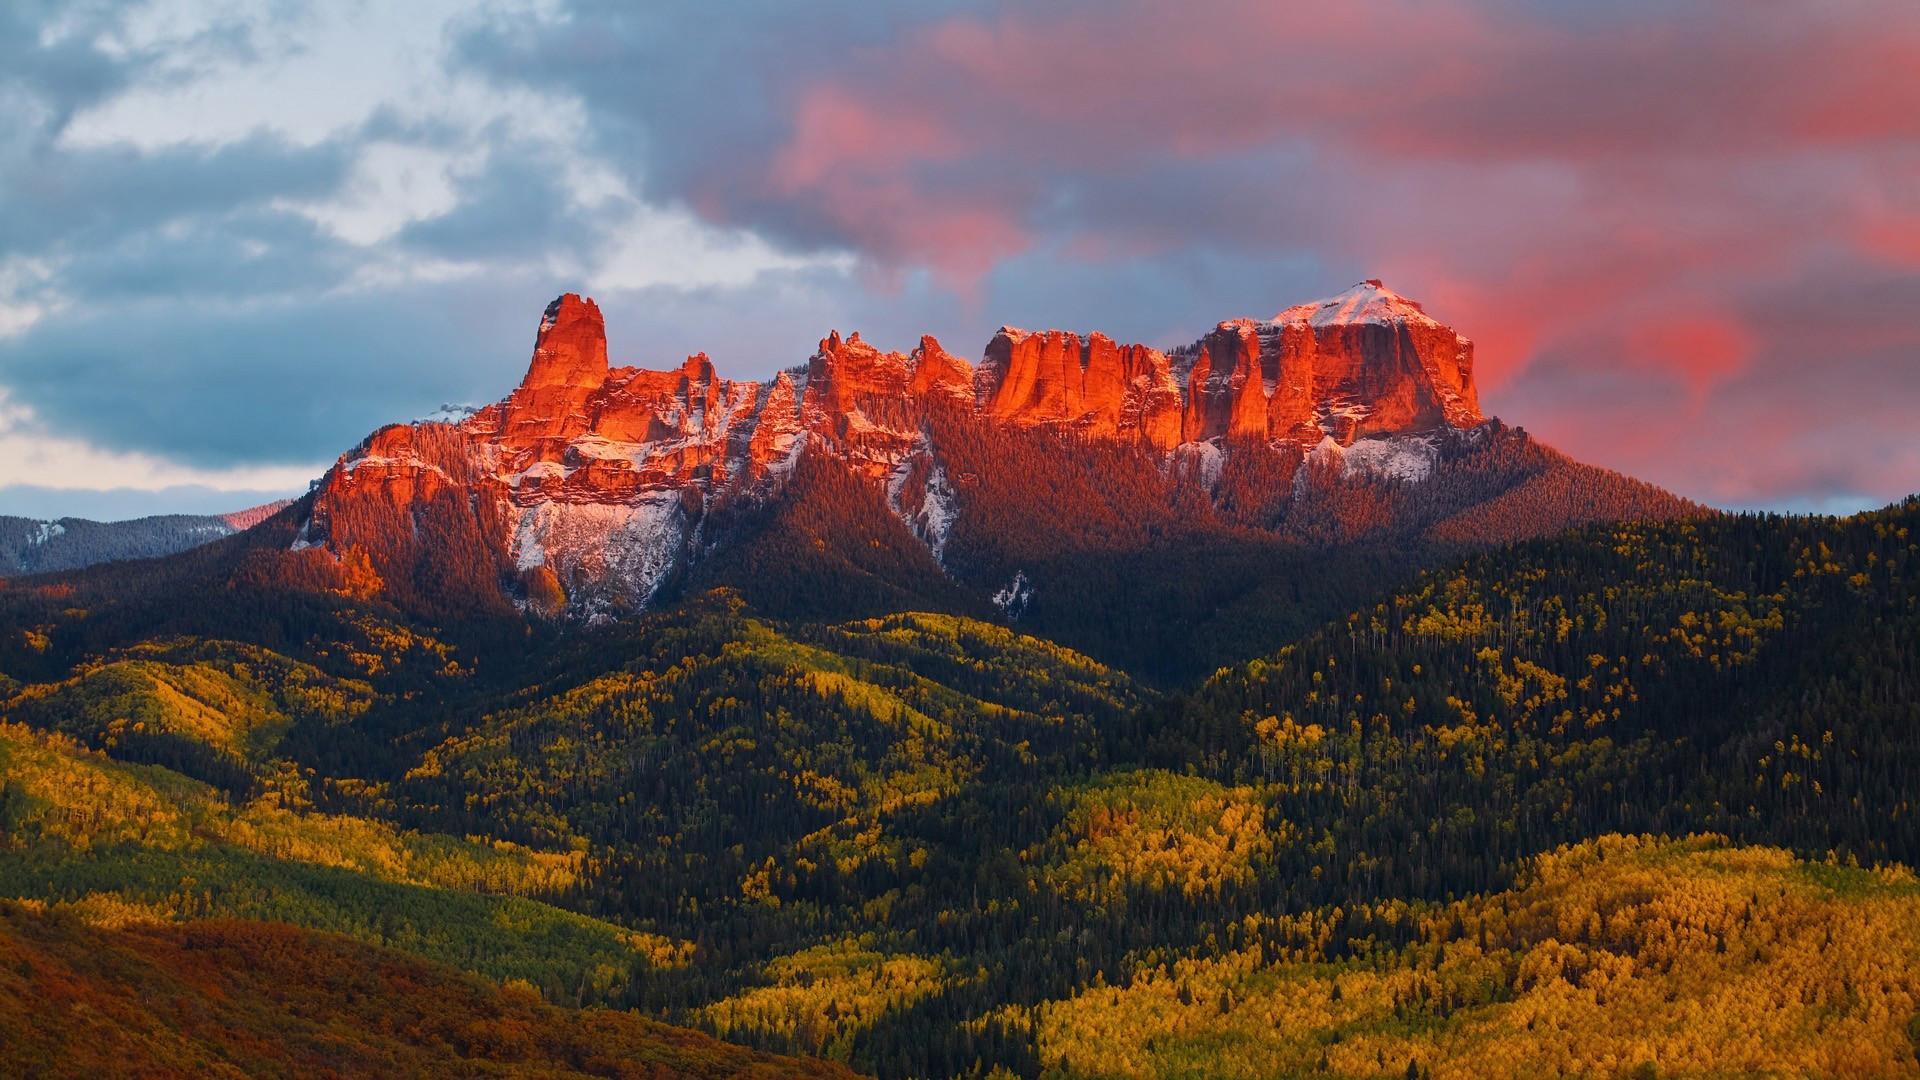 скалы горы закат  № 371282 загрузить